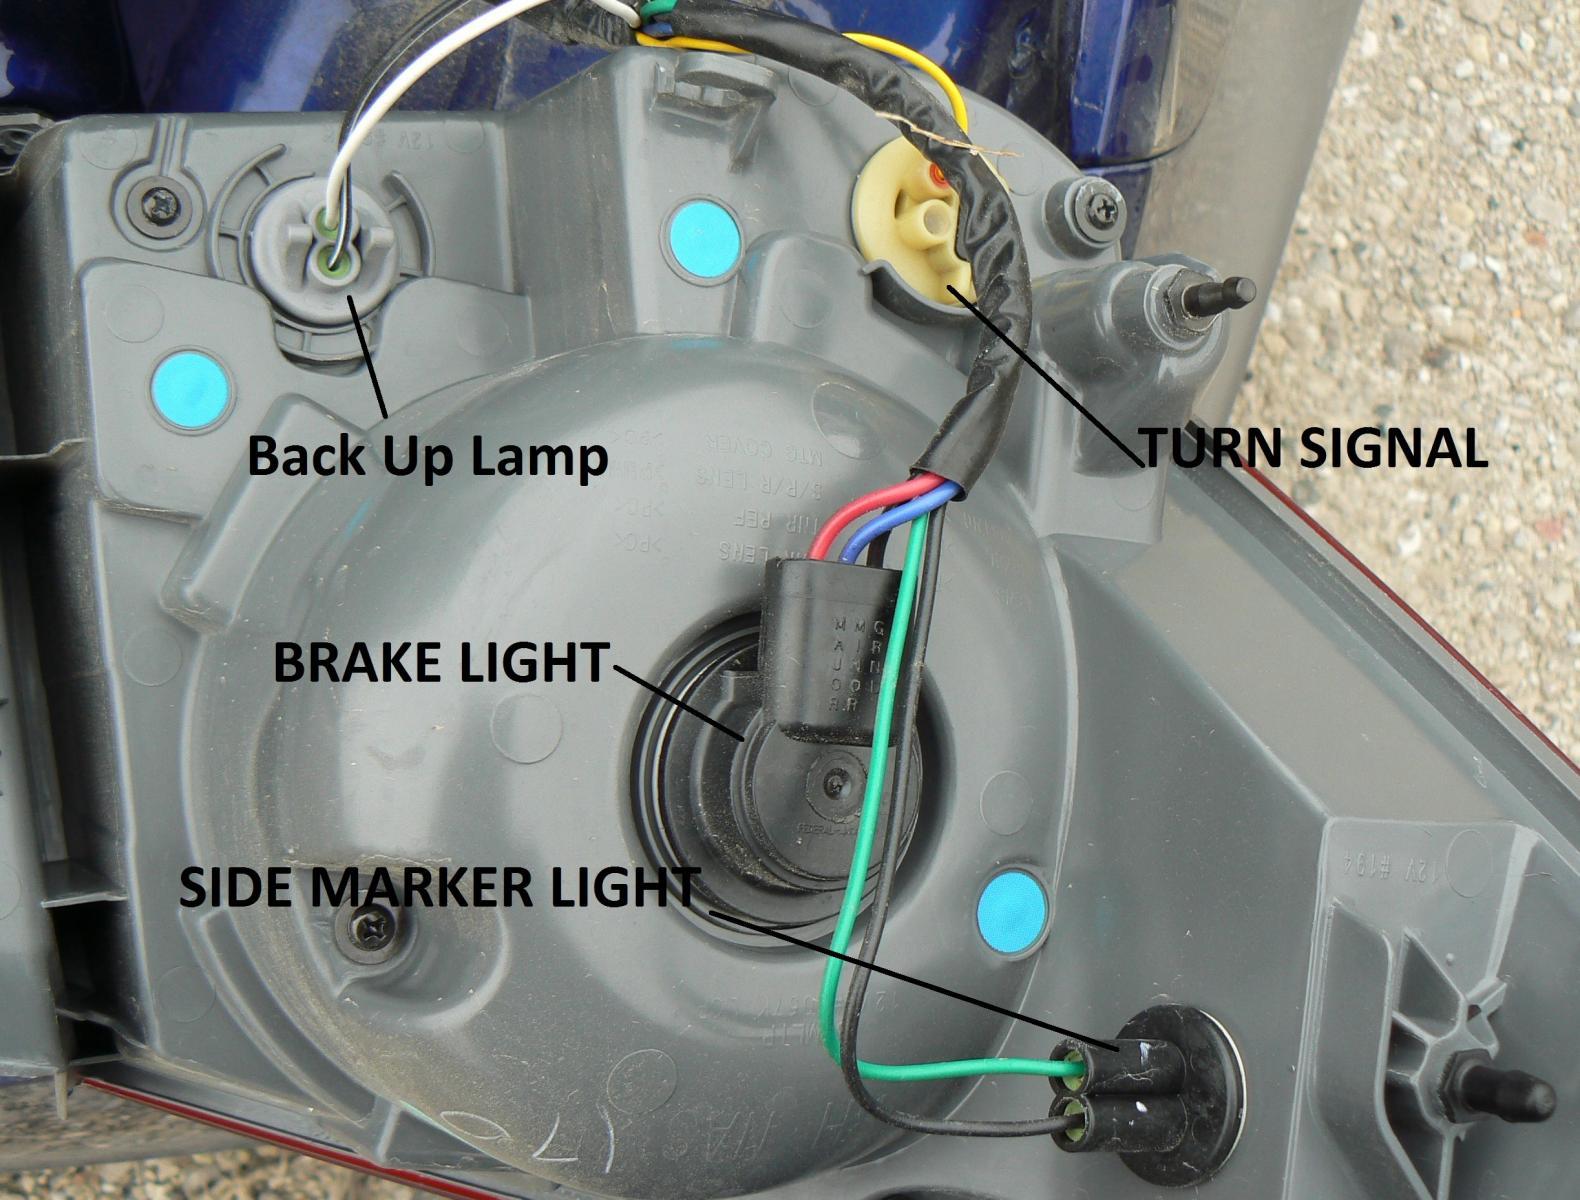 hight resolution of how to install a back up camera cheaply rh cruzetalk com backup camera wiring diagram boyo backup camera wiring